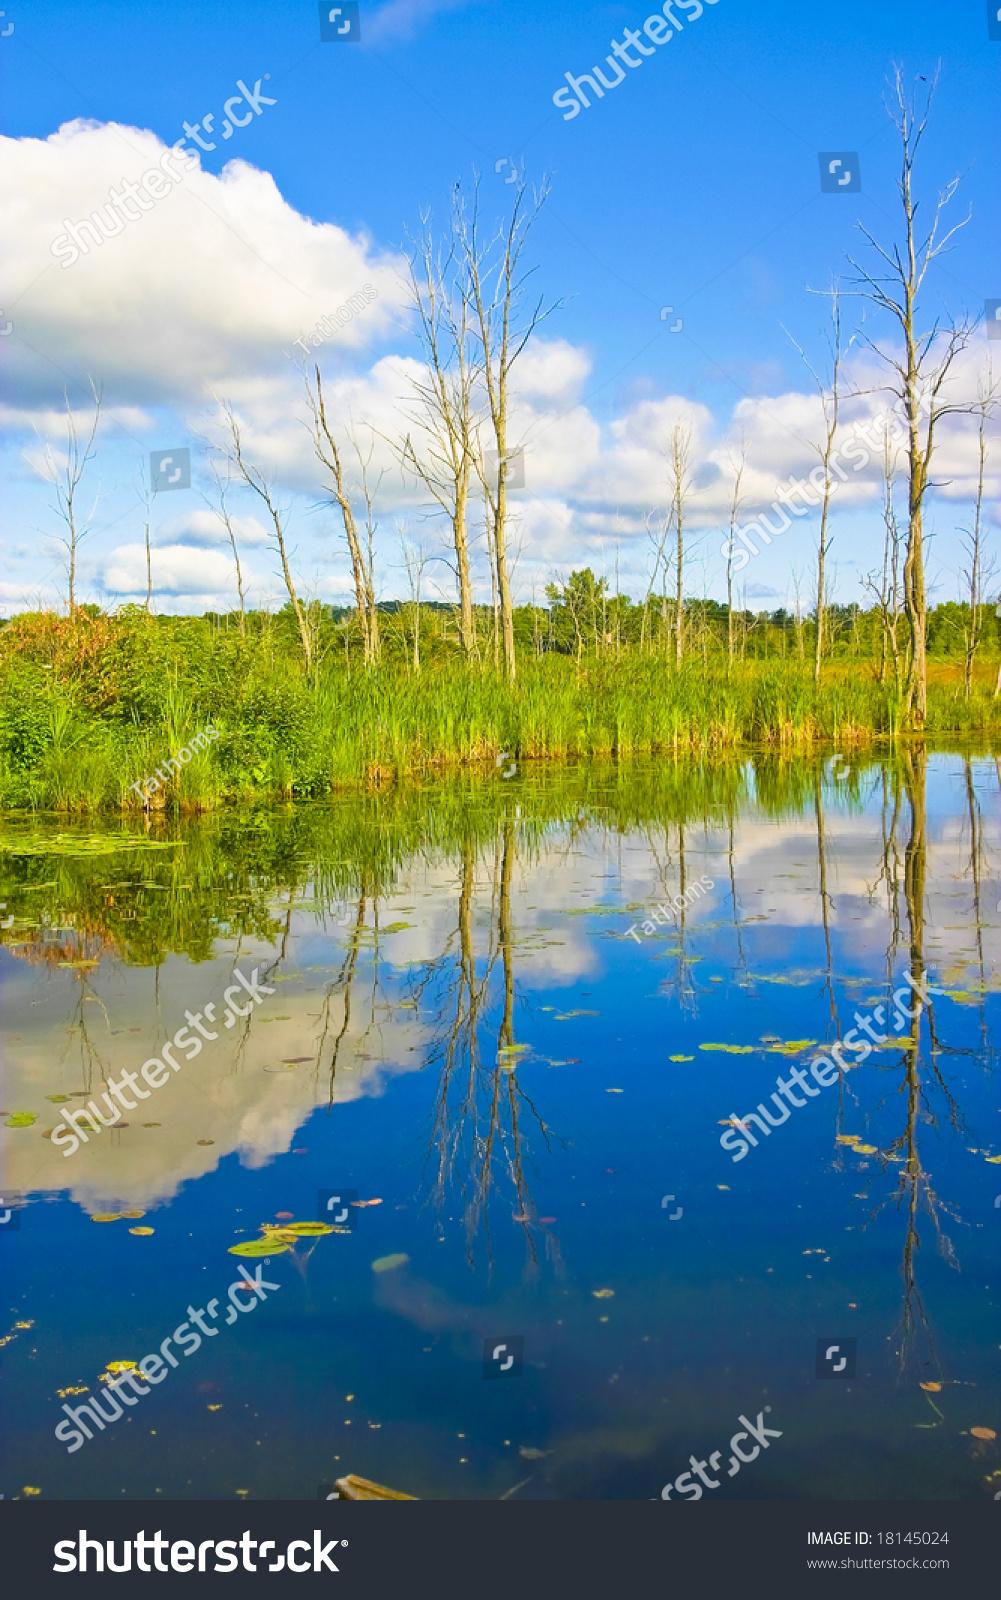 Sunny countryside landscape